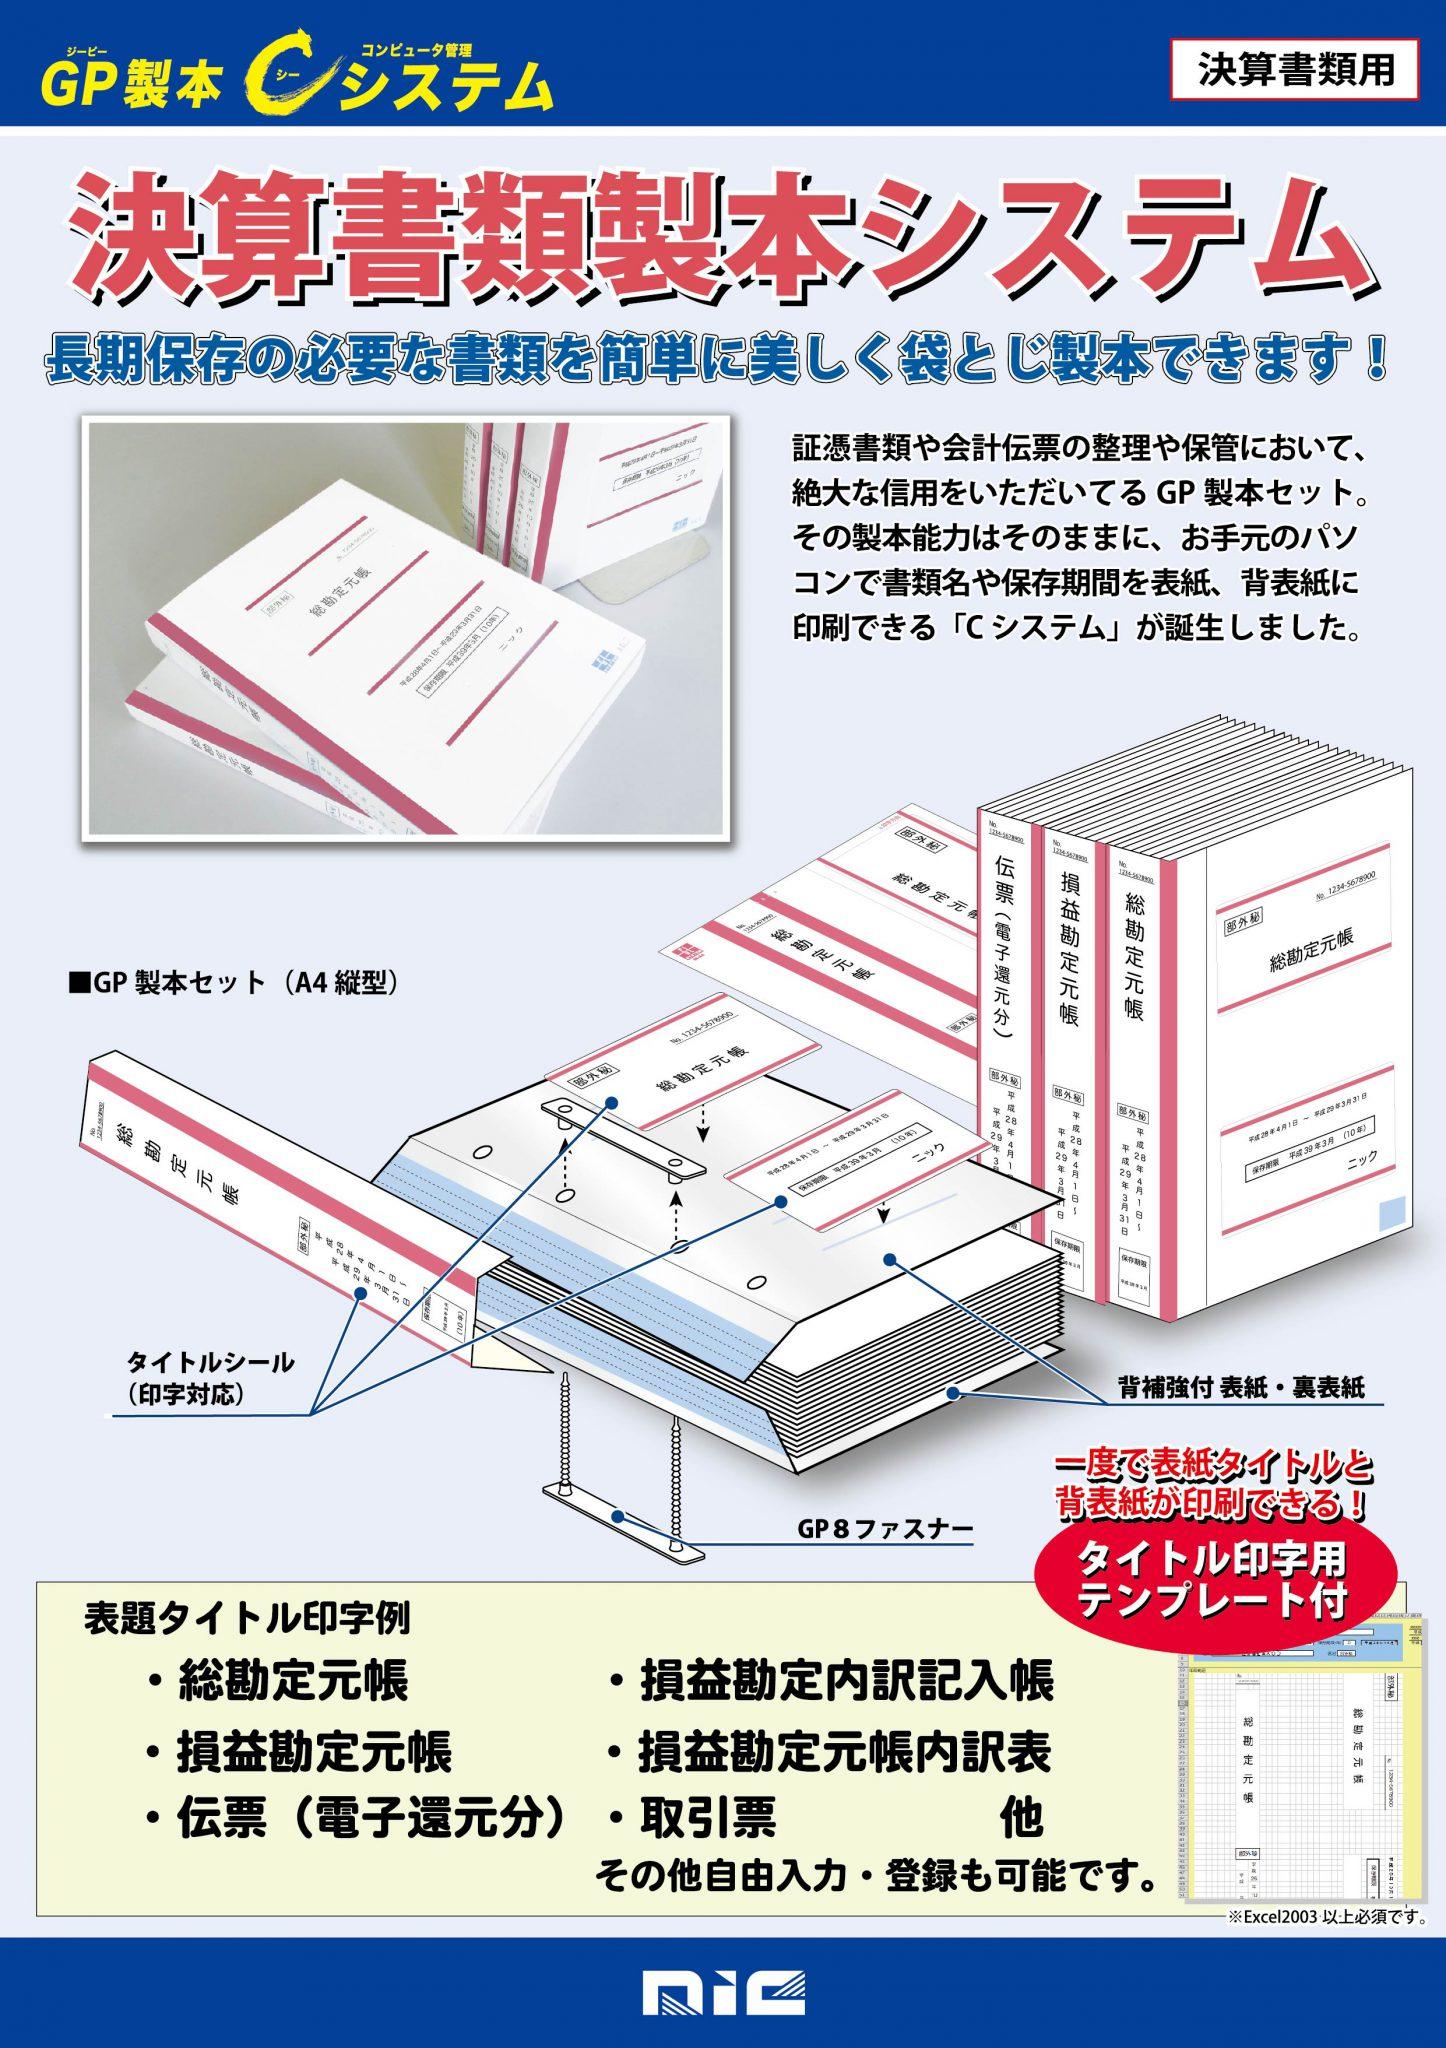 【JA様向け】決算書類製本システム